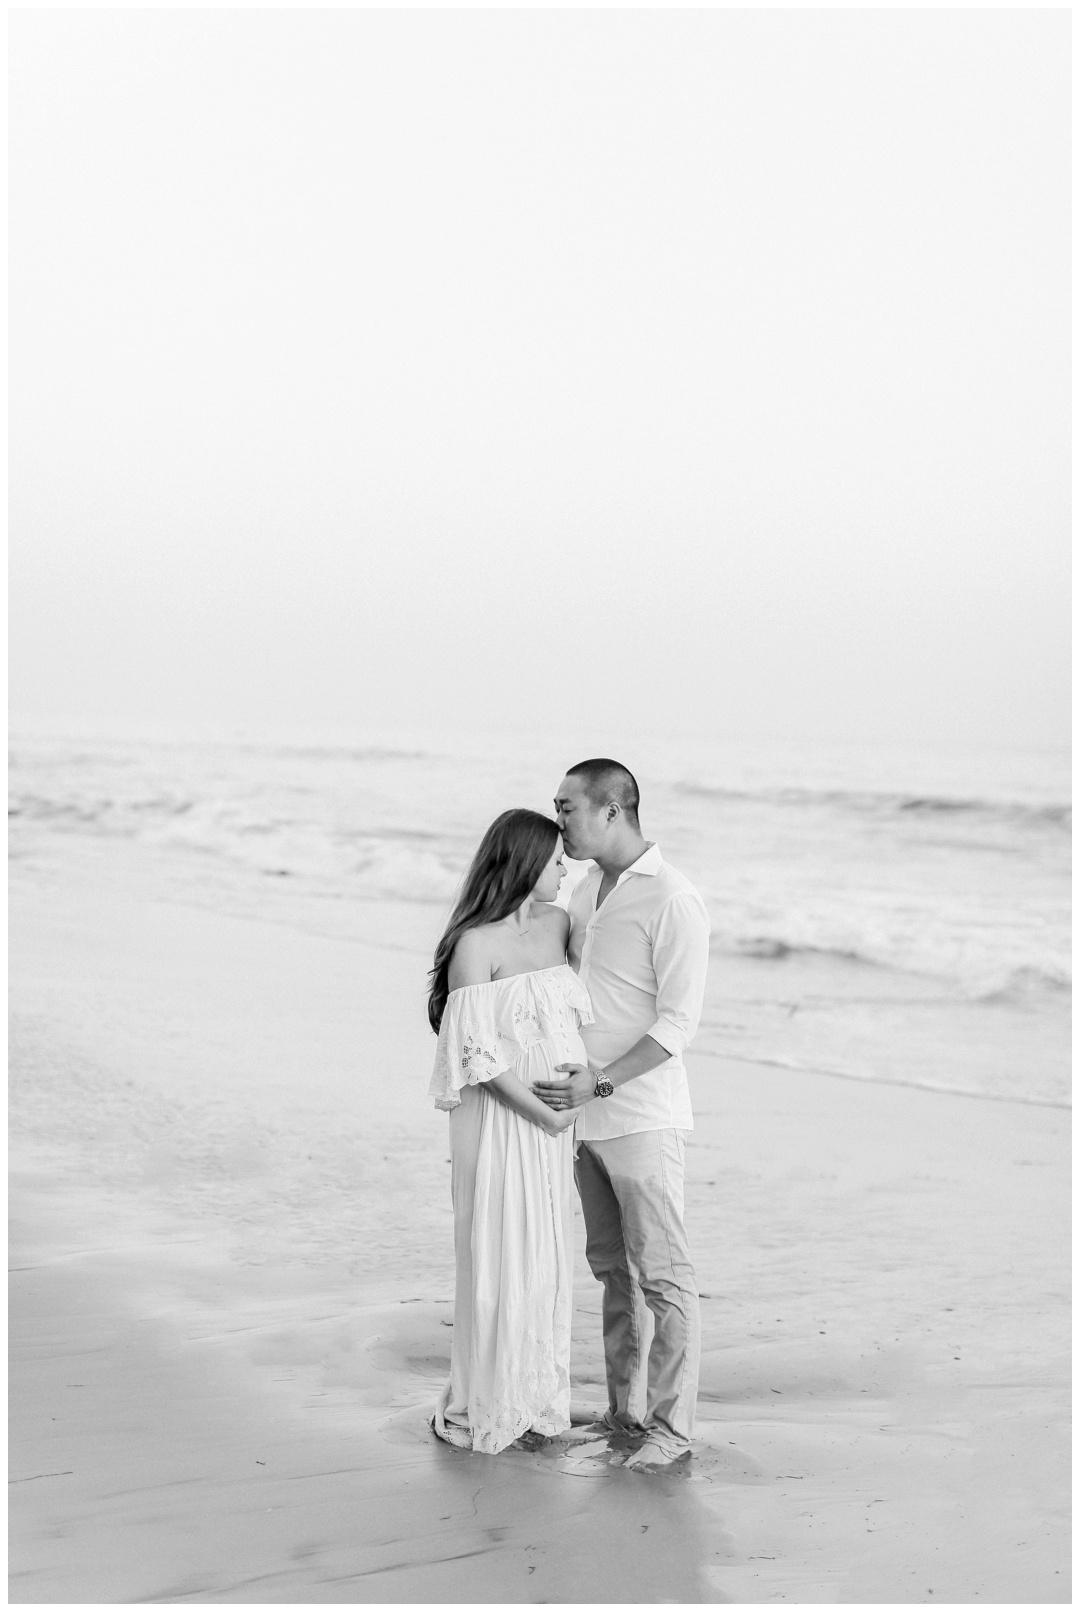 Newport_Beach_Maternity_Photographer_Beach_Maternity_Photography_Cori_Kleckner_Photography_1008.jpg